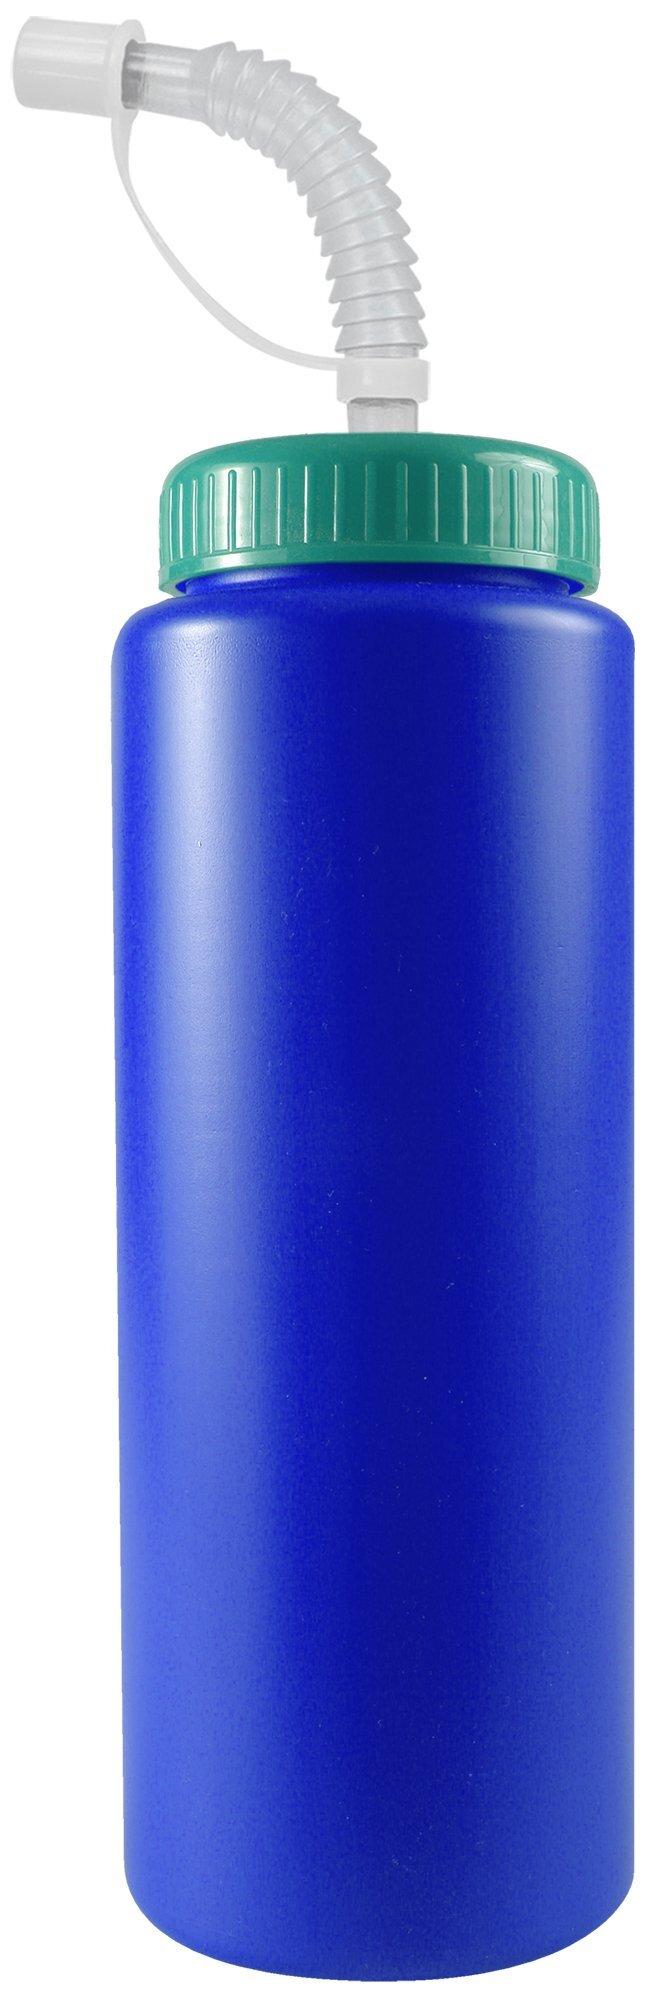 Squeeze Bottle, 32oz. - Flexible Straw Lid